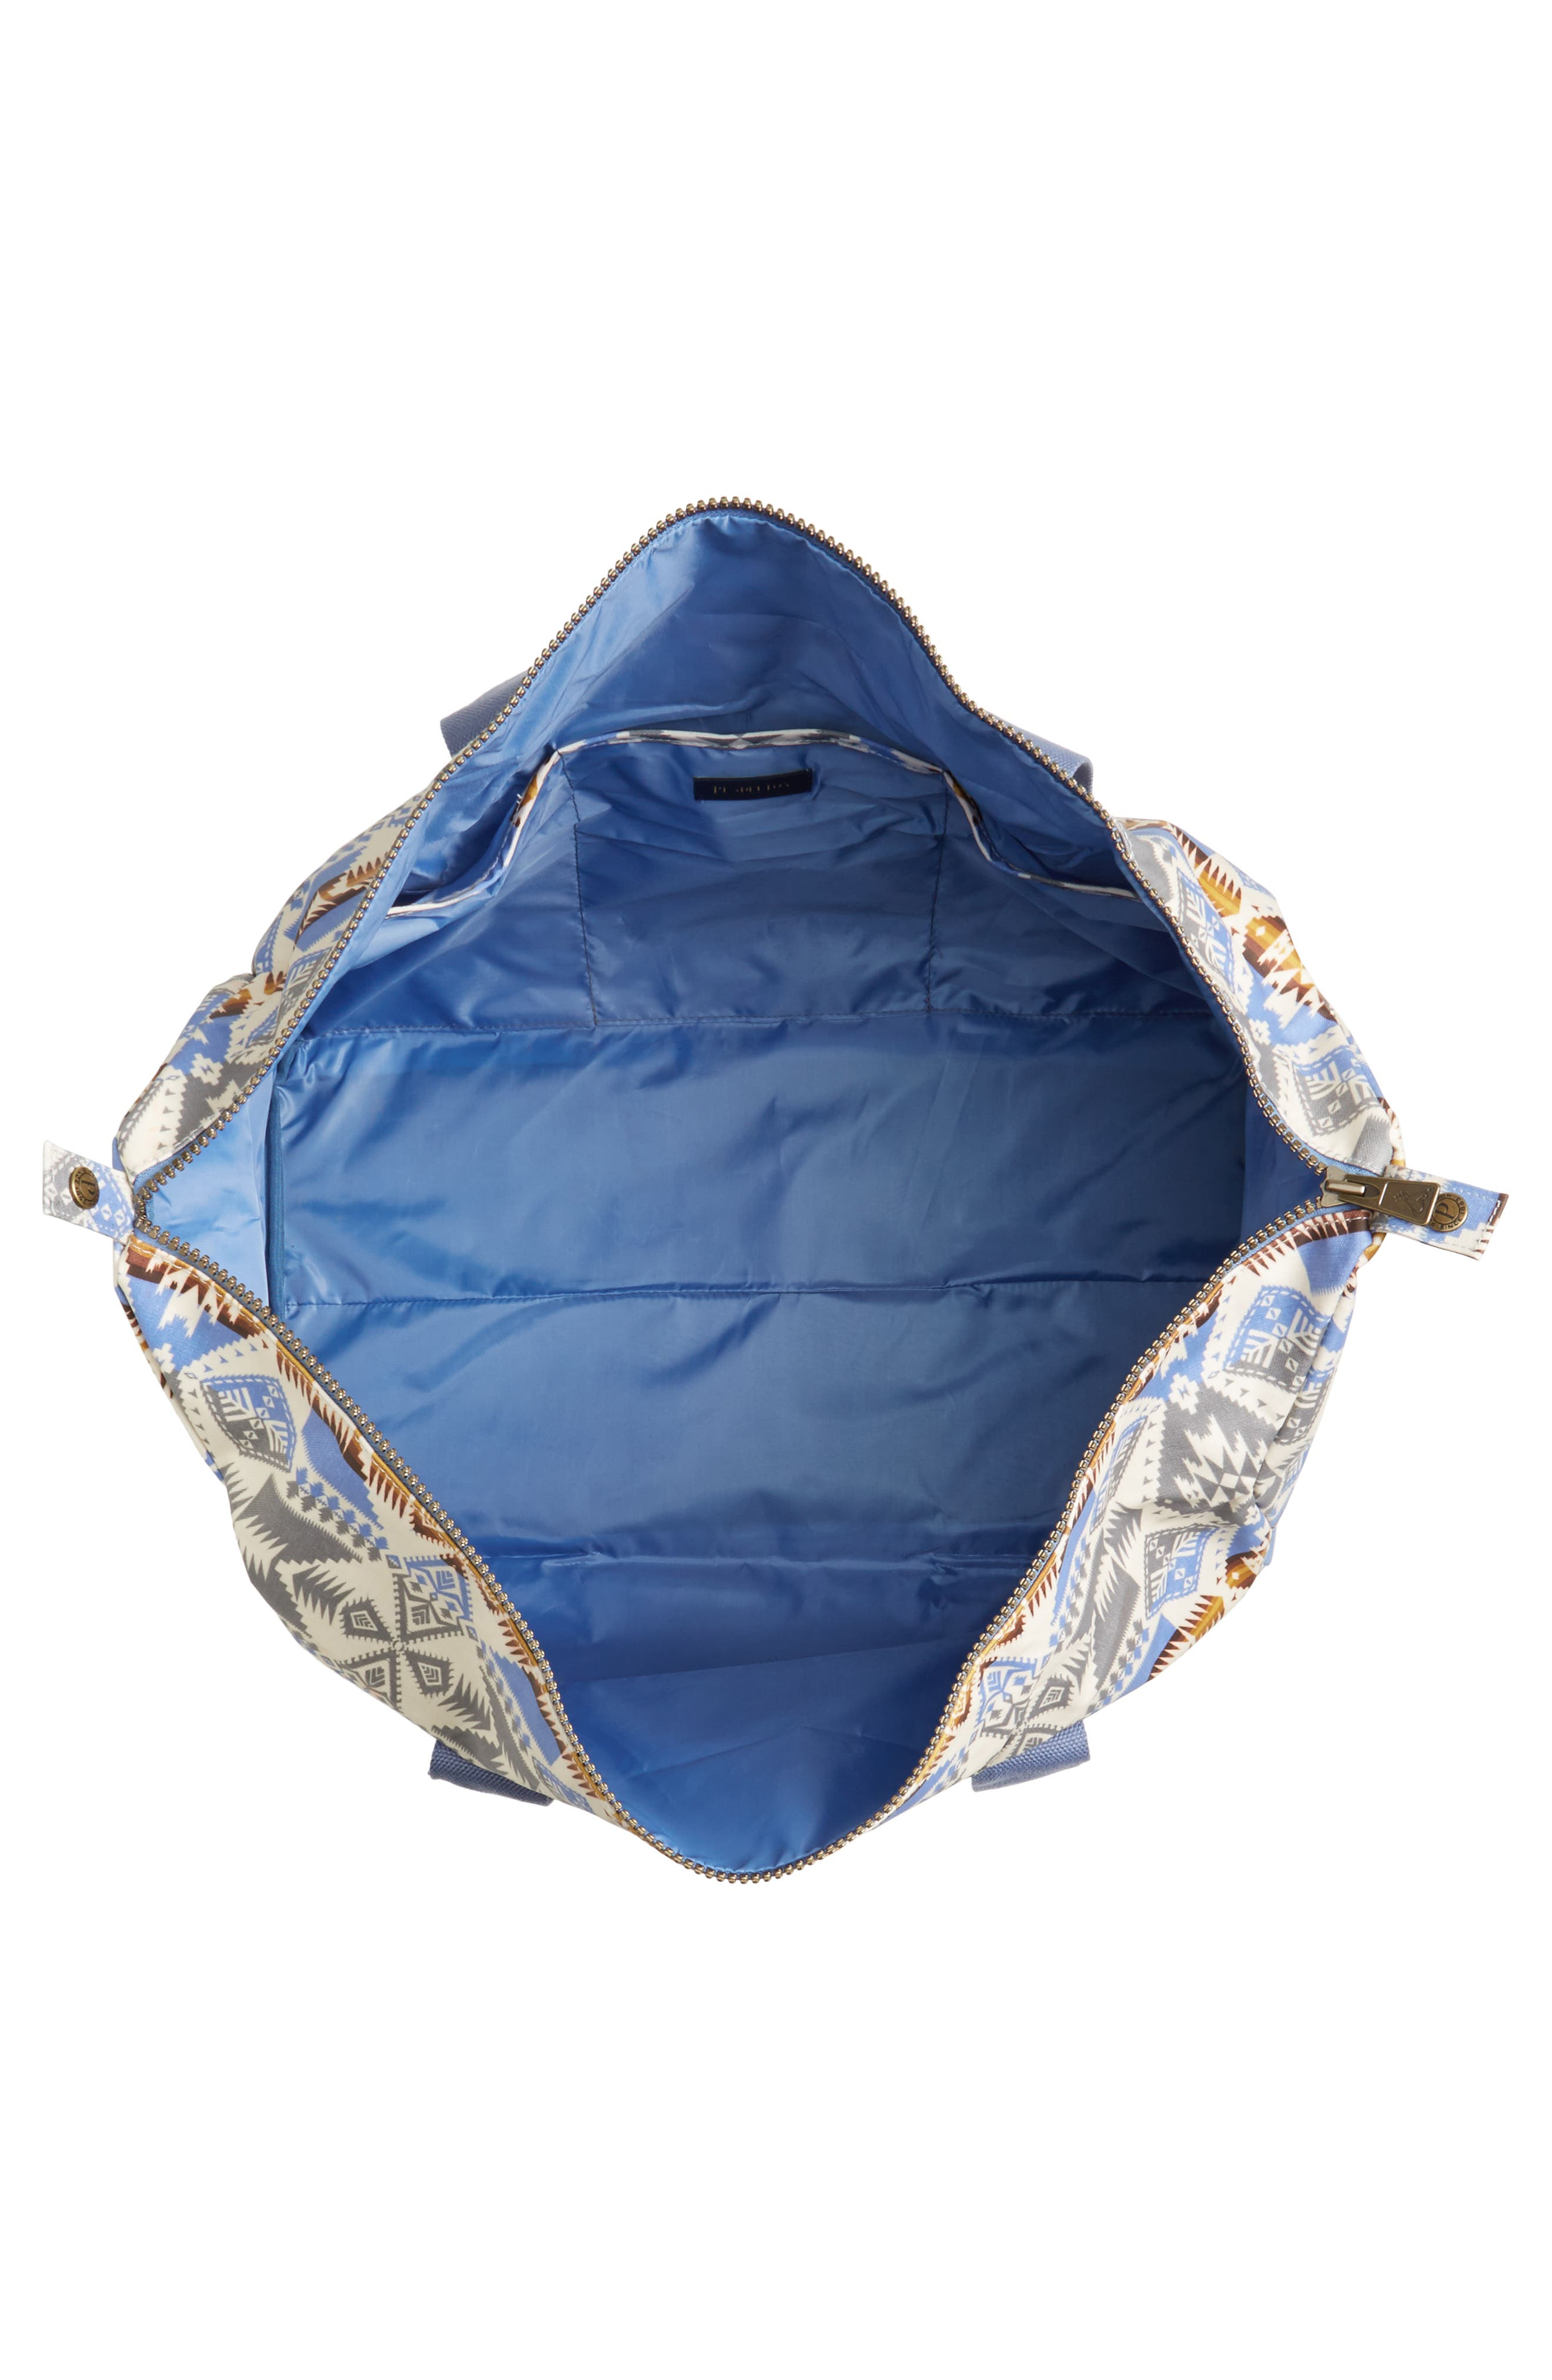 Canopy Duffel Bag,                             Alternate thumbnail 4, color,                             040